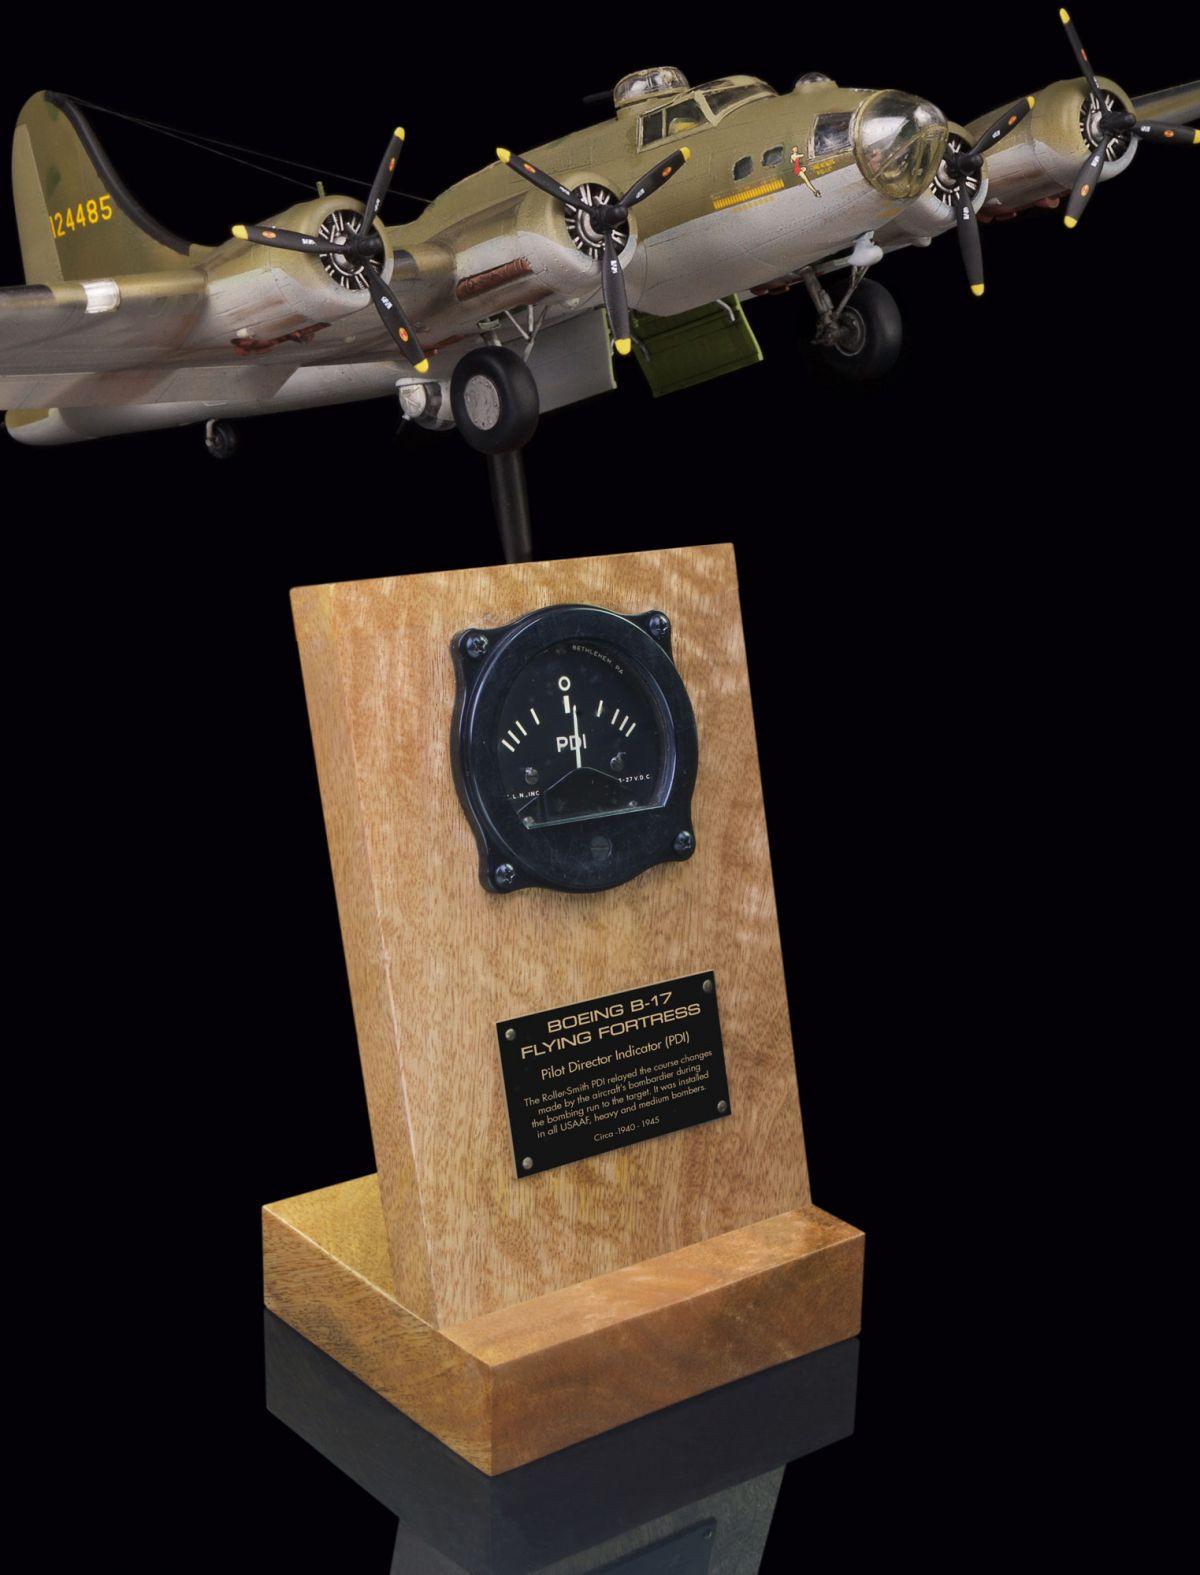 B-17 FLYING FORTRESS PILOT DIRECTOR INDICATOR (PDI)